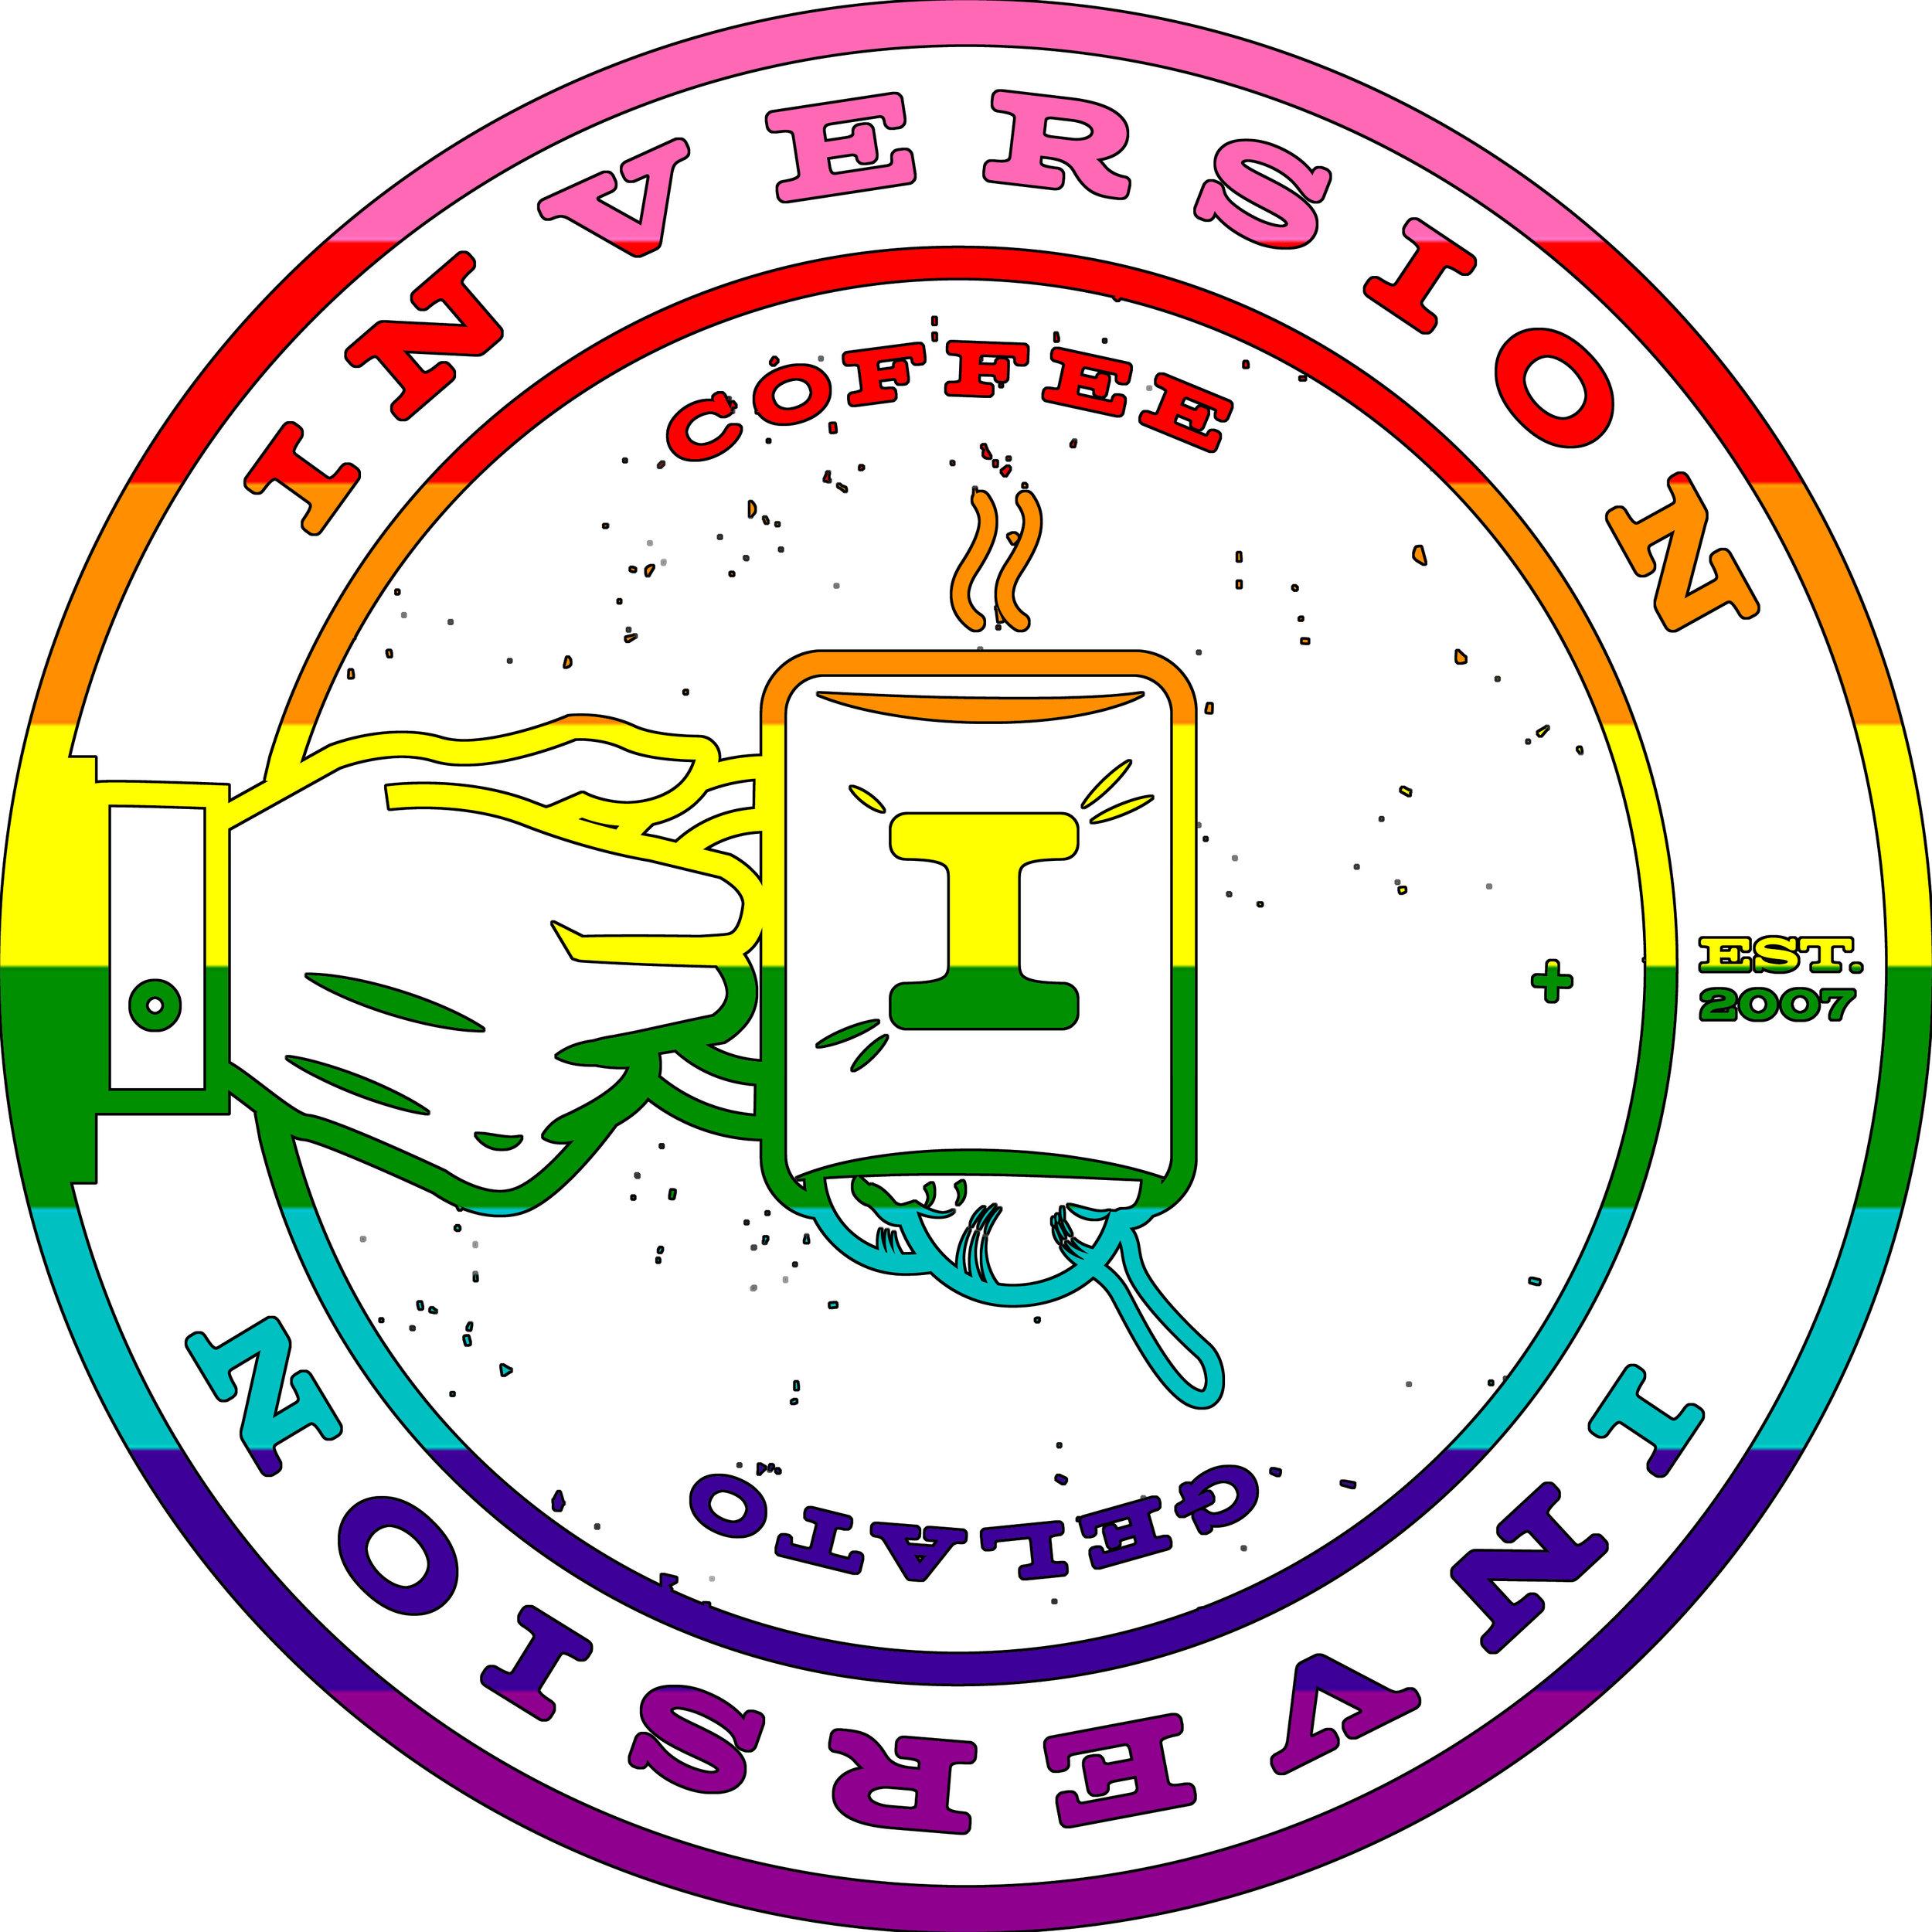 Inversion_pride_Logo(8_stripe_1978_original).jpg